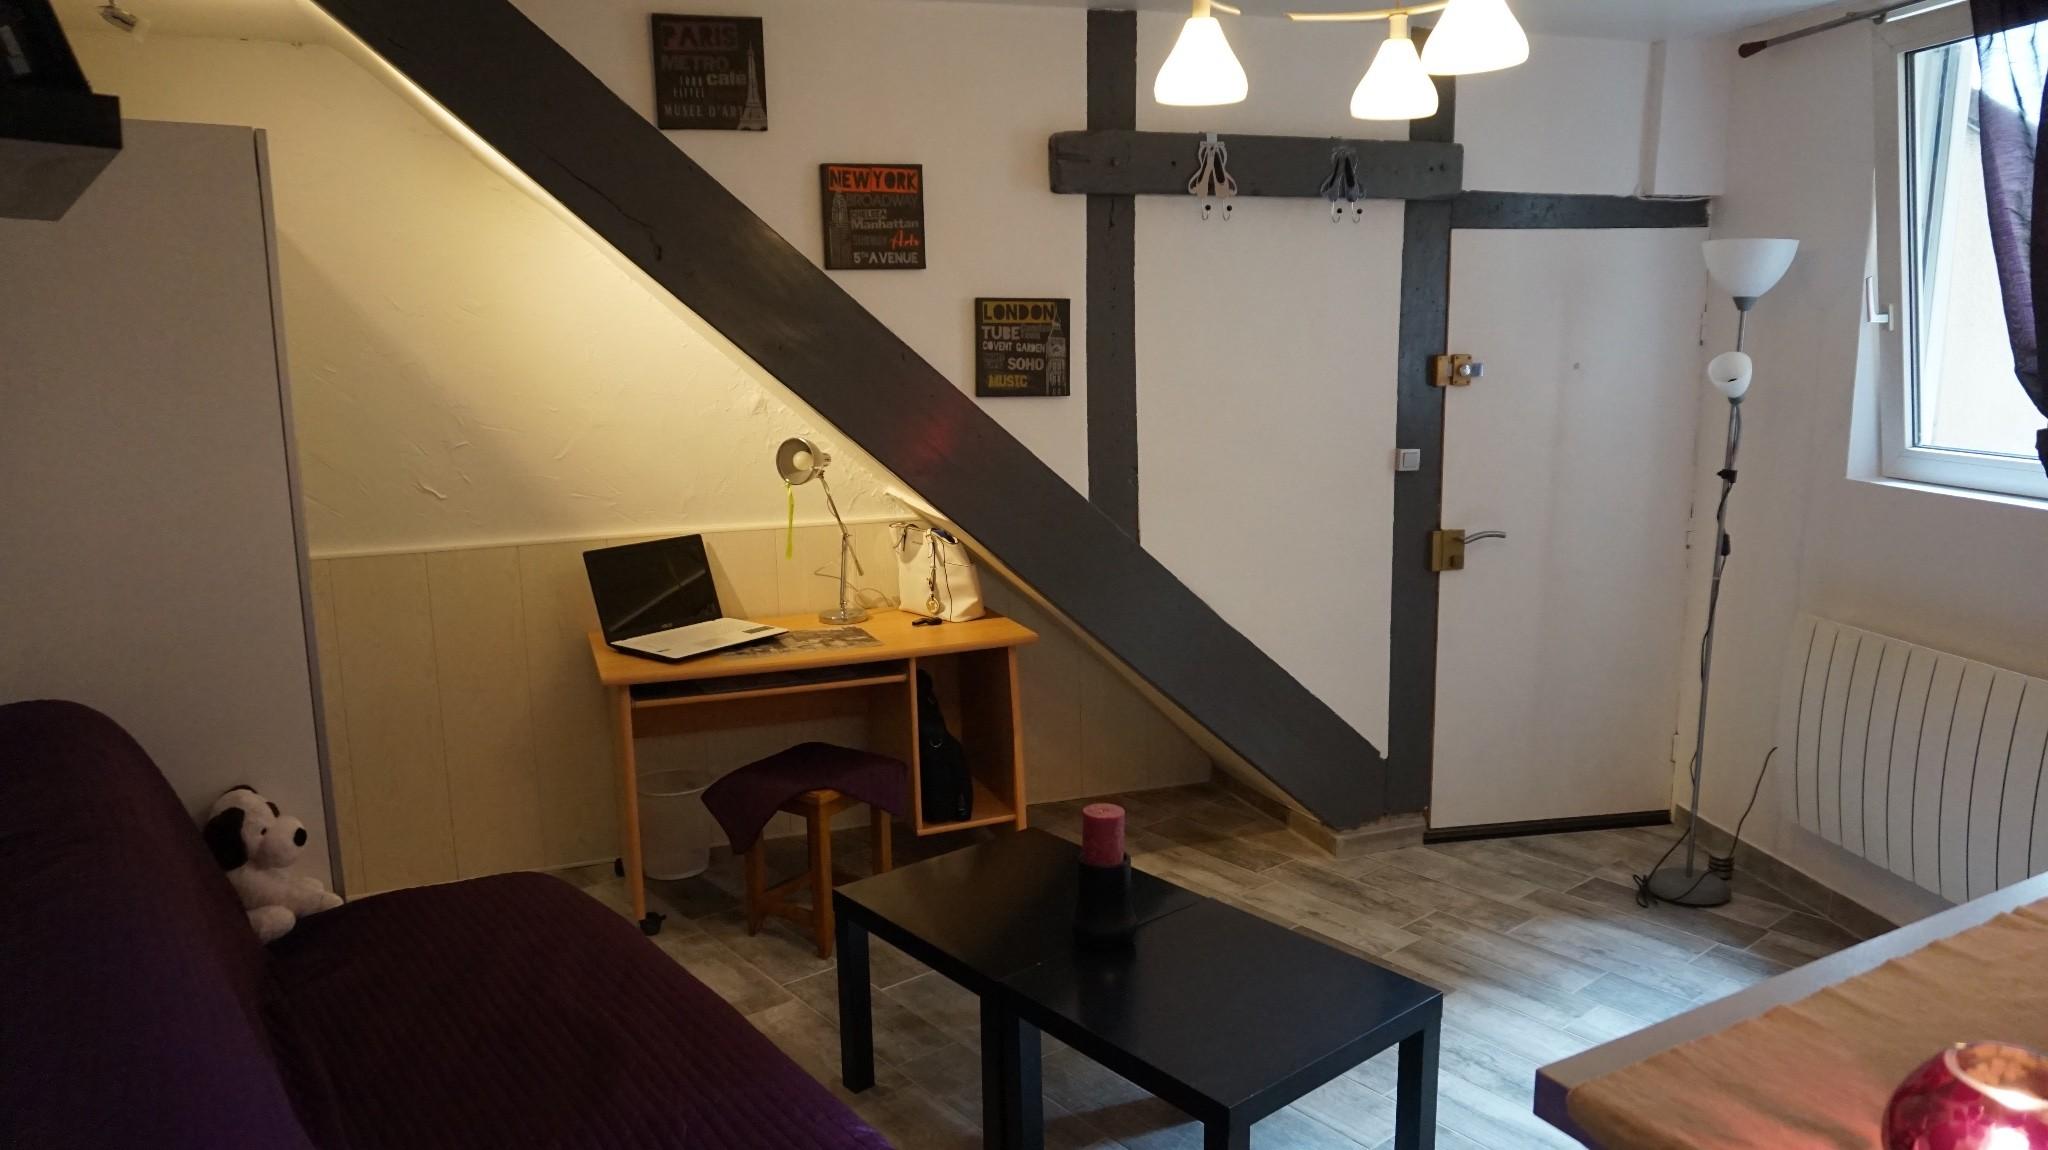 dijon centre ville facs location appartement 1 pi ce 20m2 380 cc r f 17 36 152408. Black Bedroom Furniture Sets. Home Design Ideas